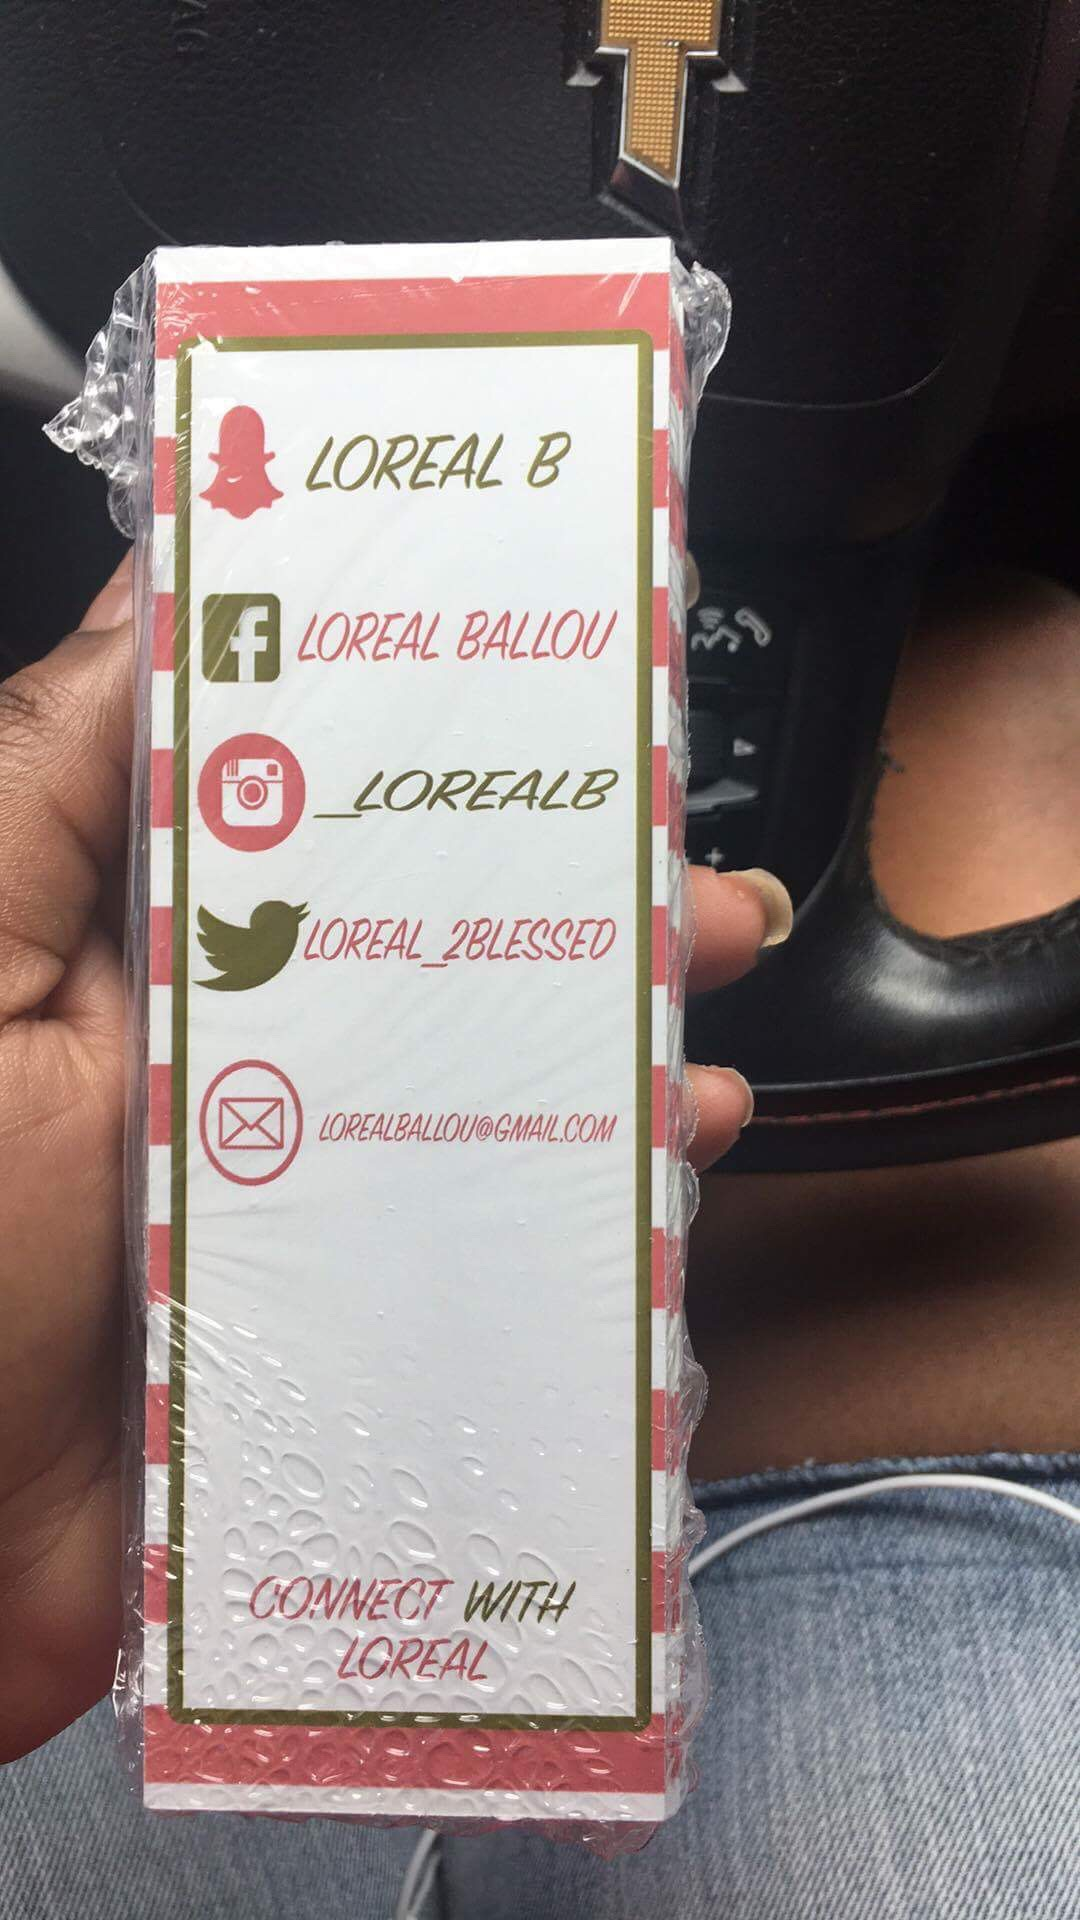 lorealssocialmedia